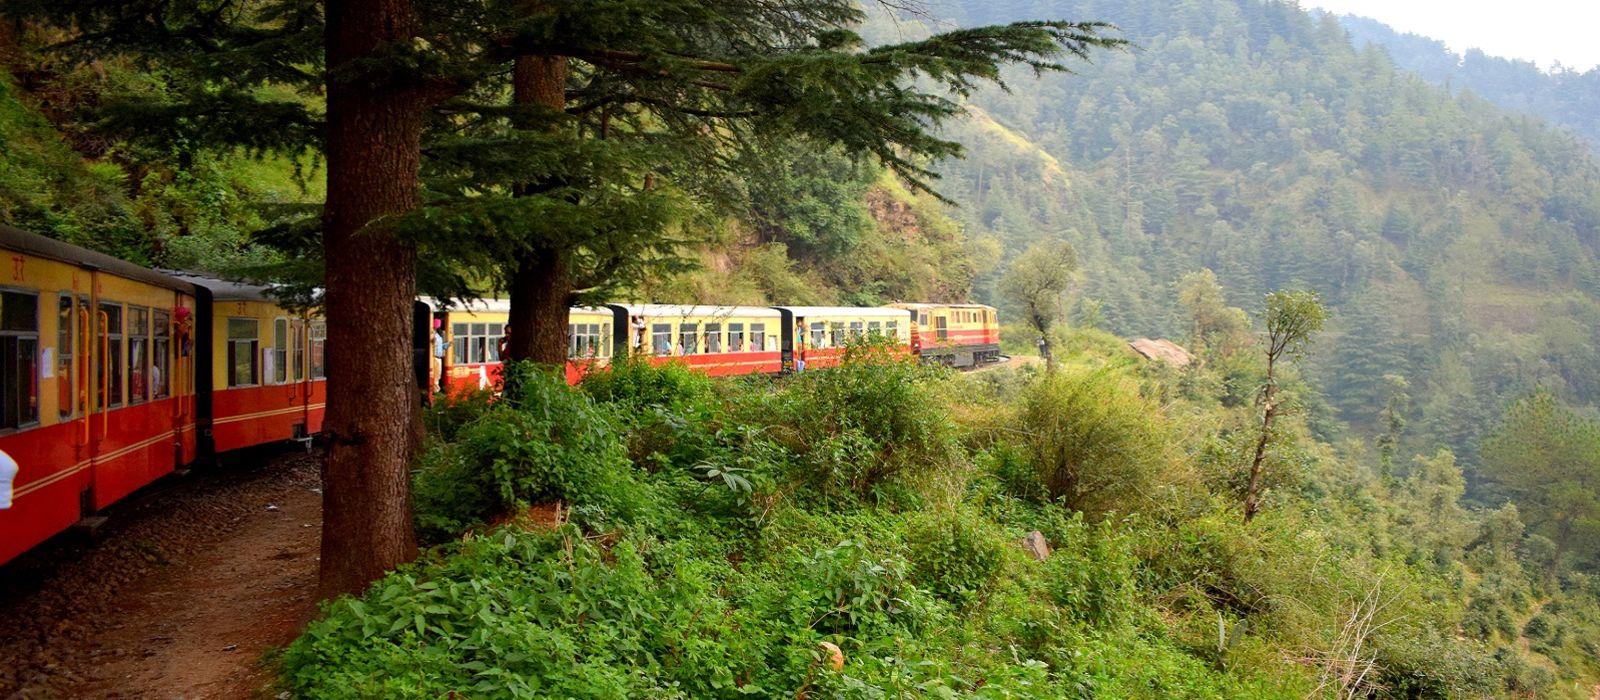 Das The Oberoi Hotels & Resorts Sommerangebot: Im Himalaya Gebirge Urlaub 3